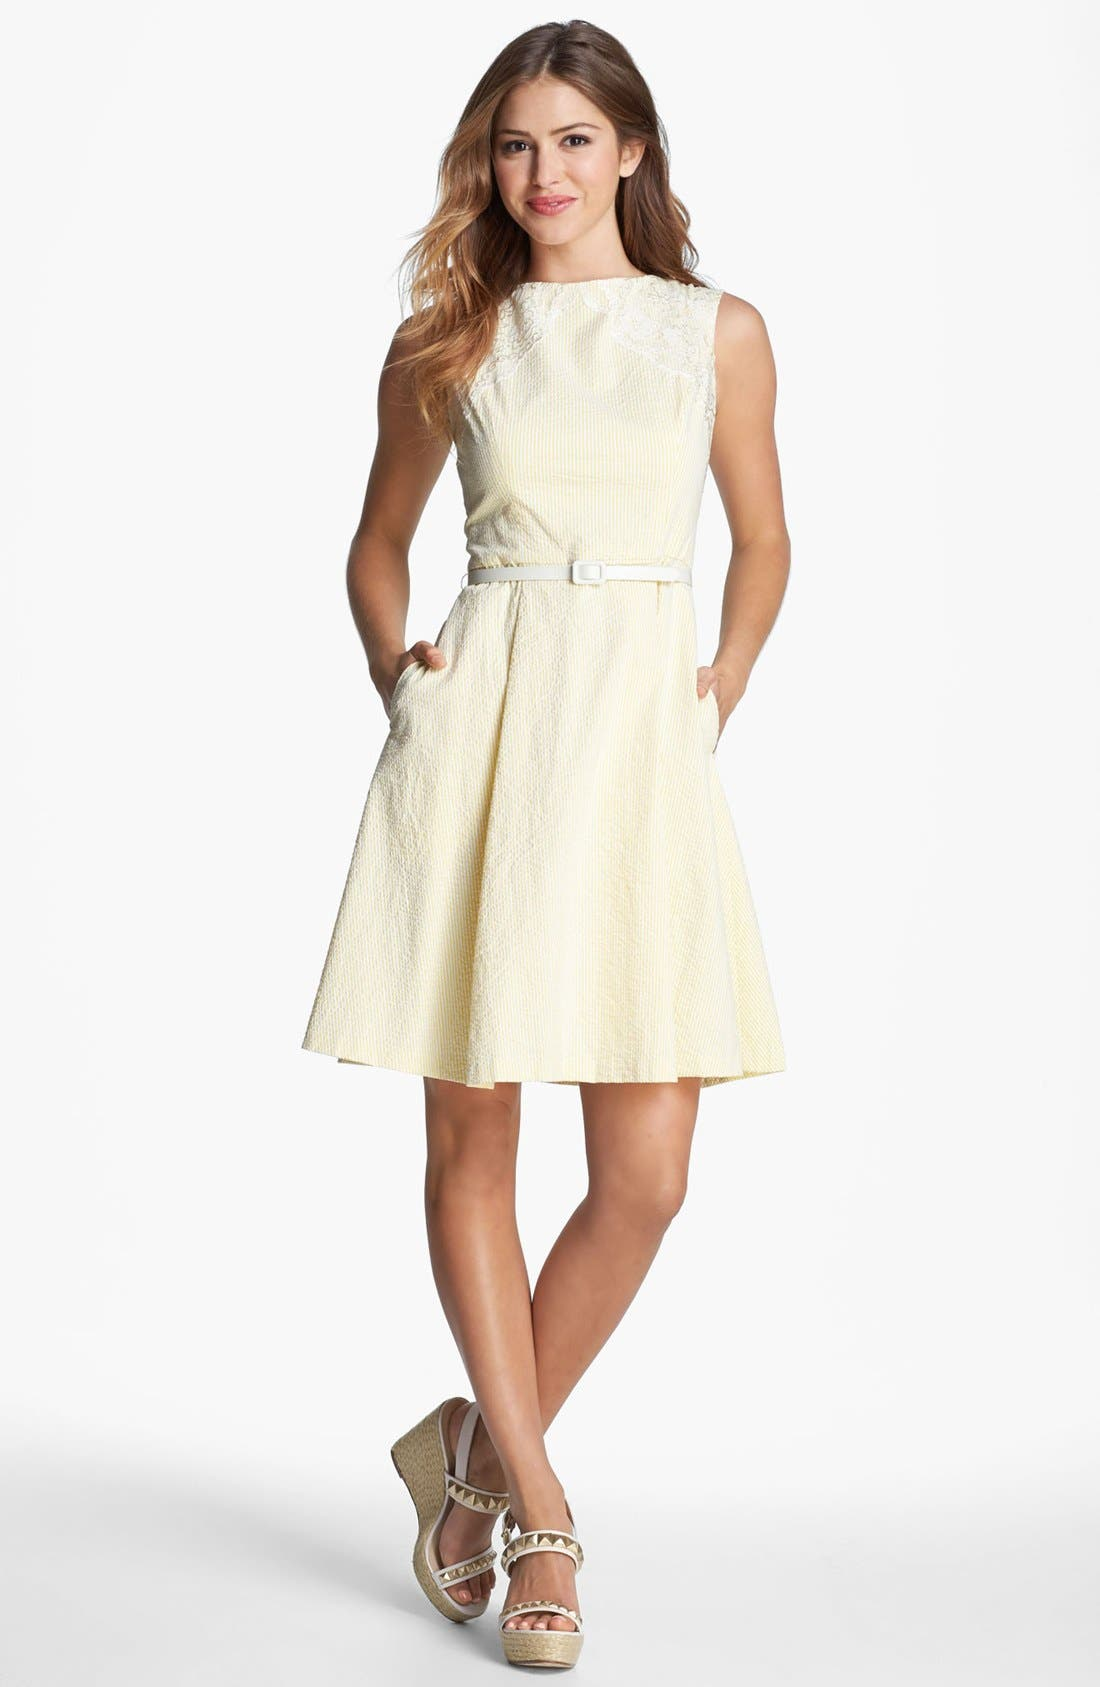 Alternate Image 1 Selected - Maggy London Seersucker Dress